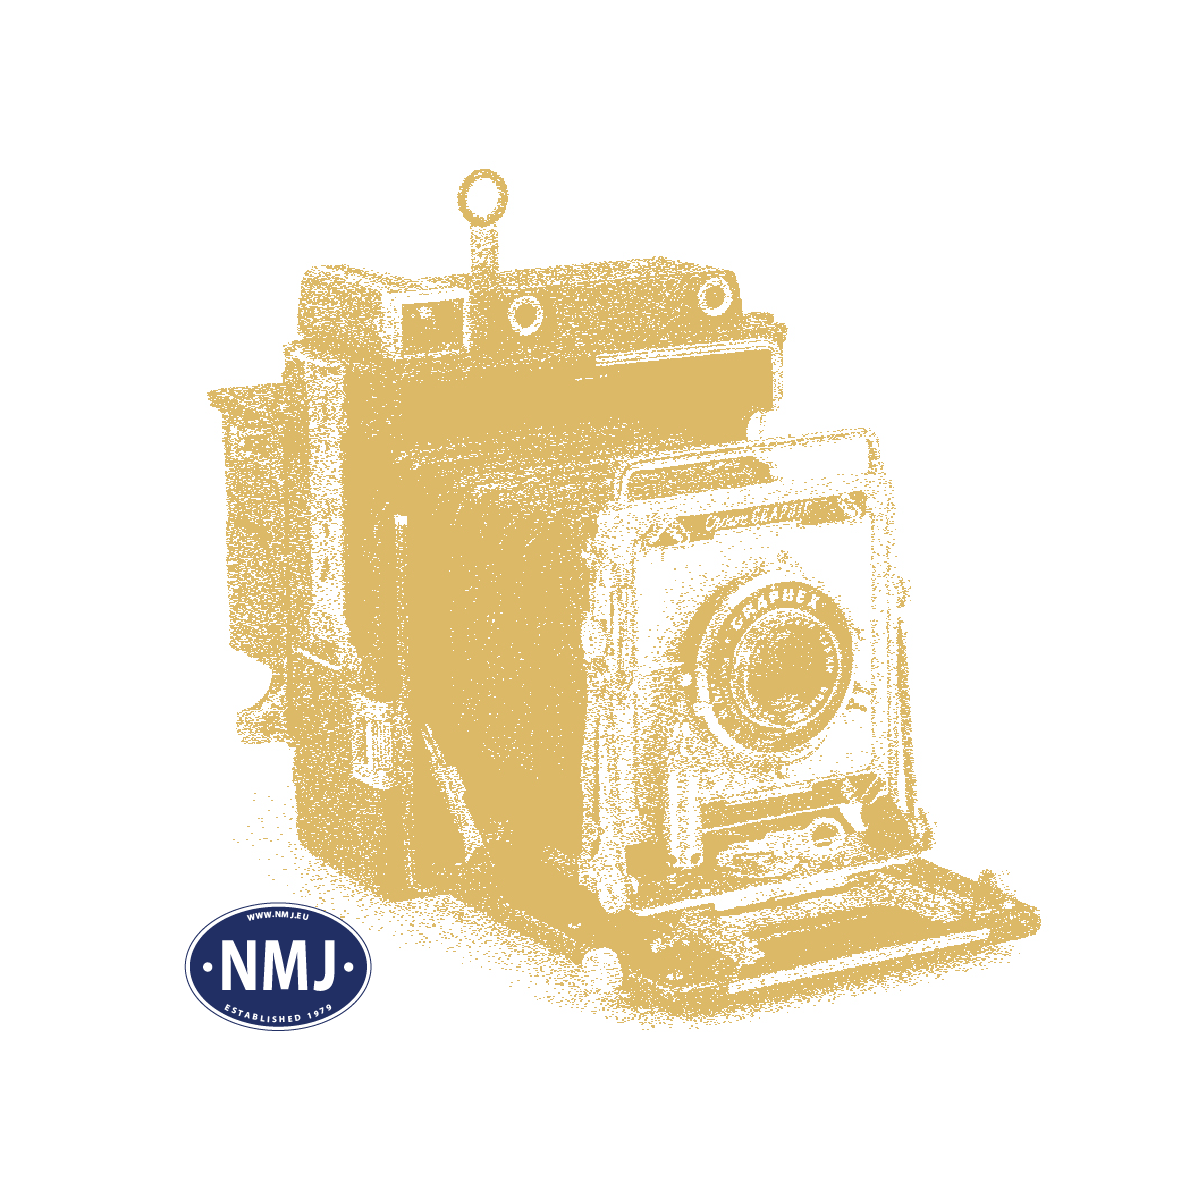 Topline Lokomotiver, nmj-topline-94140-nsb-el14-2167-dcc-Sound-H0, NMJT93140